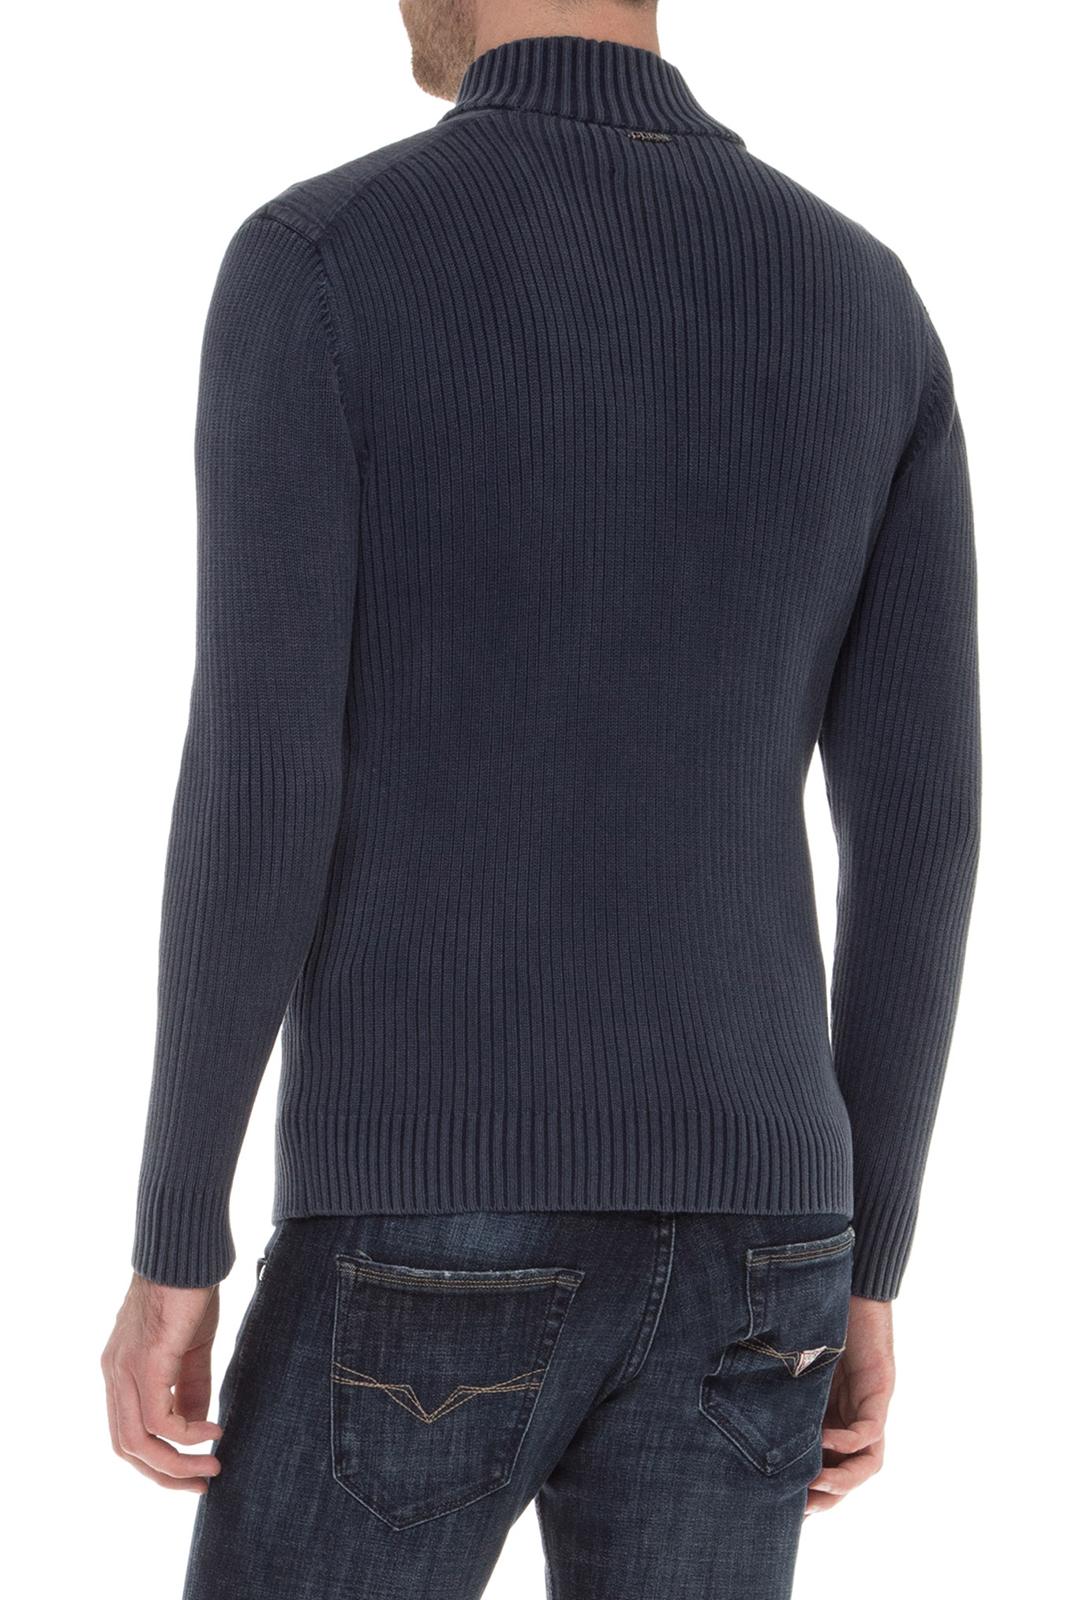 Gilets  Guess jeans M94R46Z2M20 STONE WASH